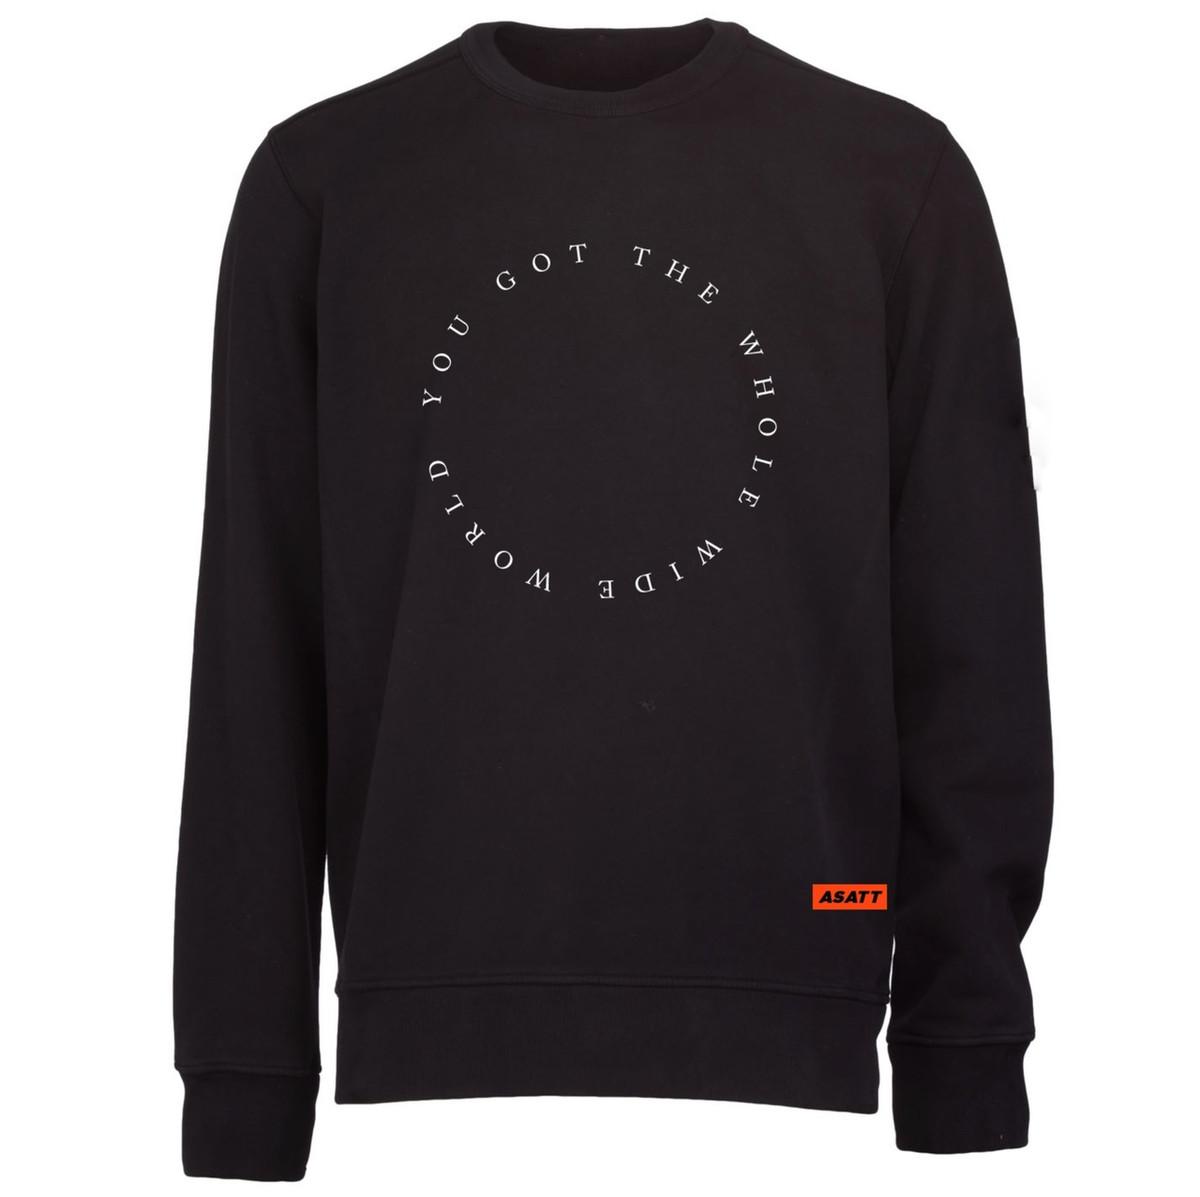 Got The Whole Wide World Crewneck Sweatshirt